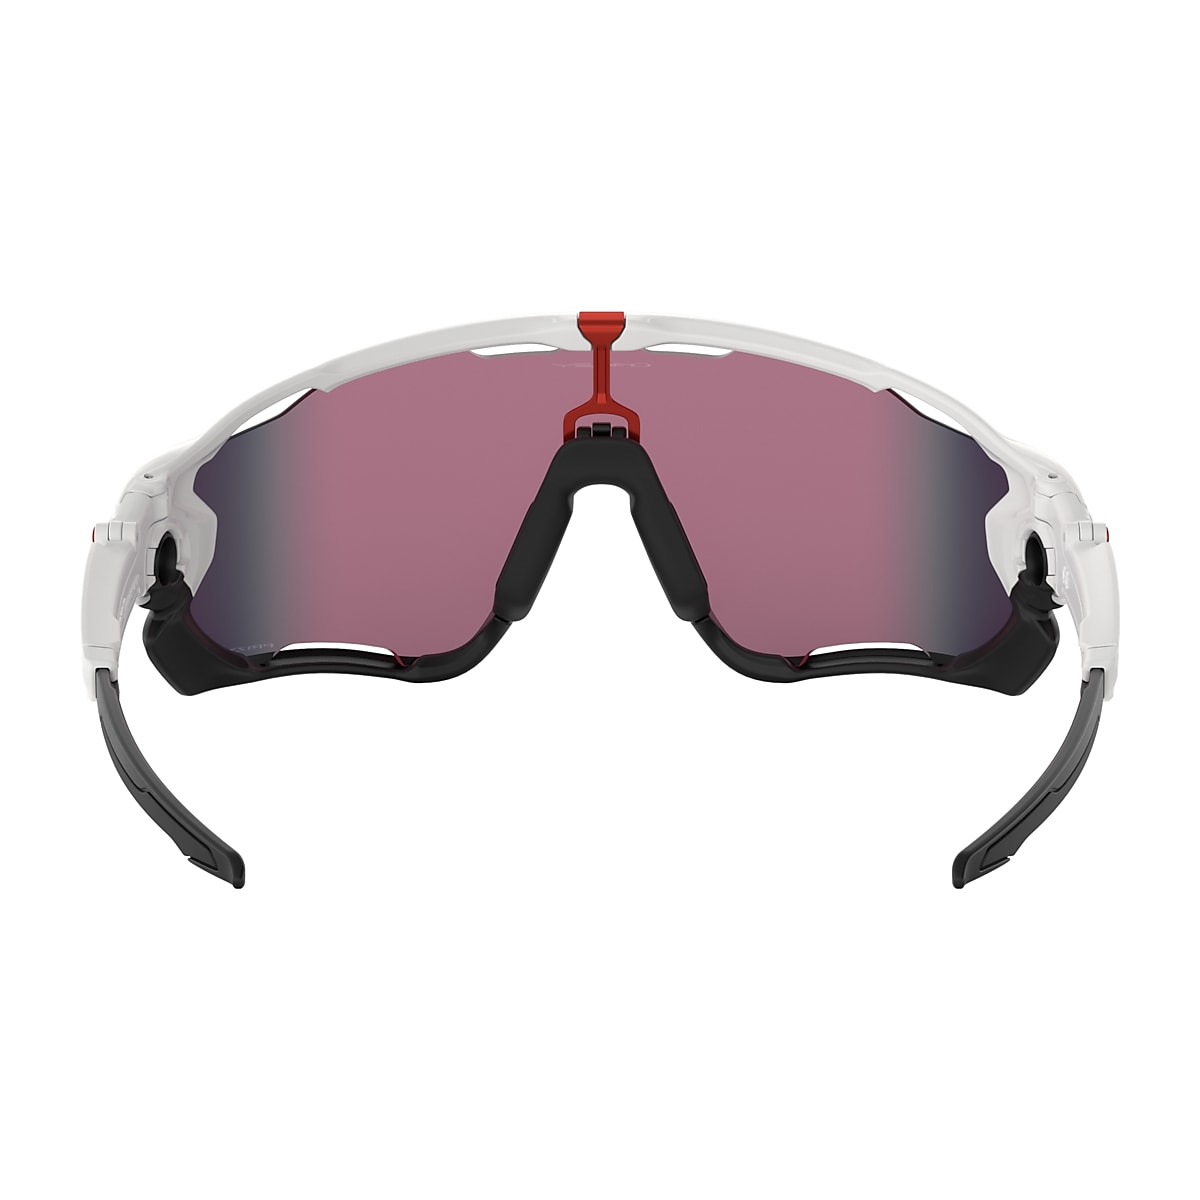 Jawbreaker Polished White Sunglasses Oakley Us